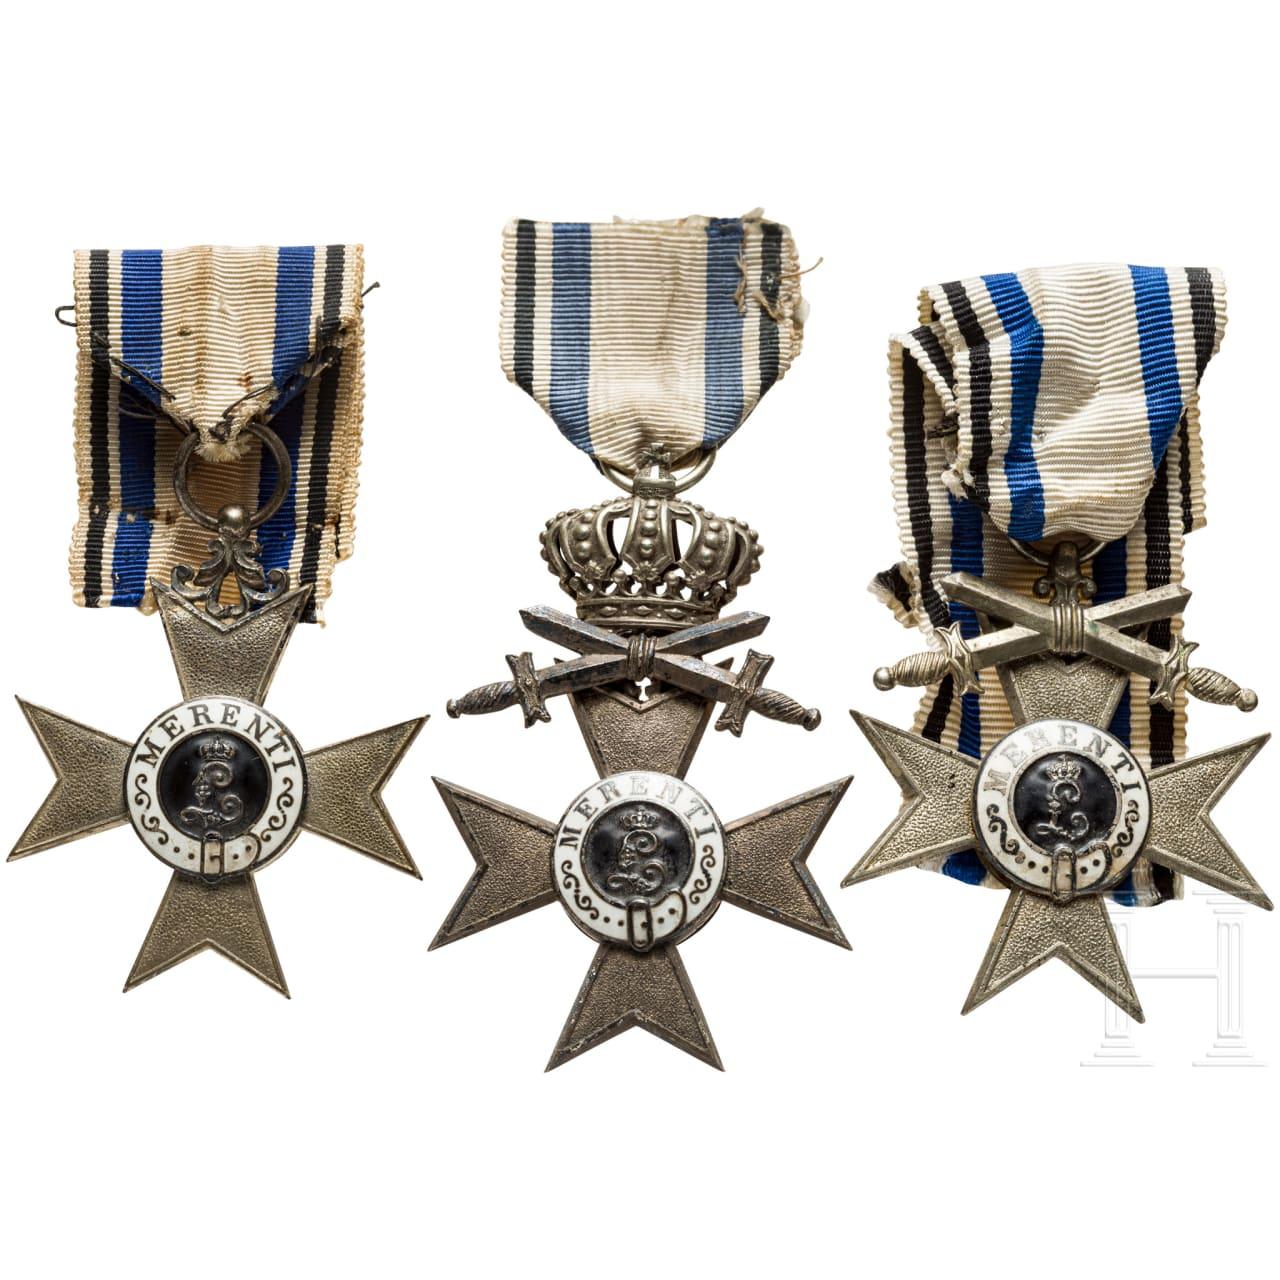 Three Military Merit Crosses 2nd class, a document